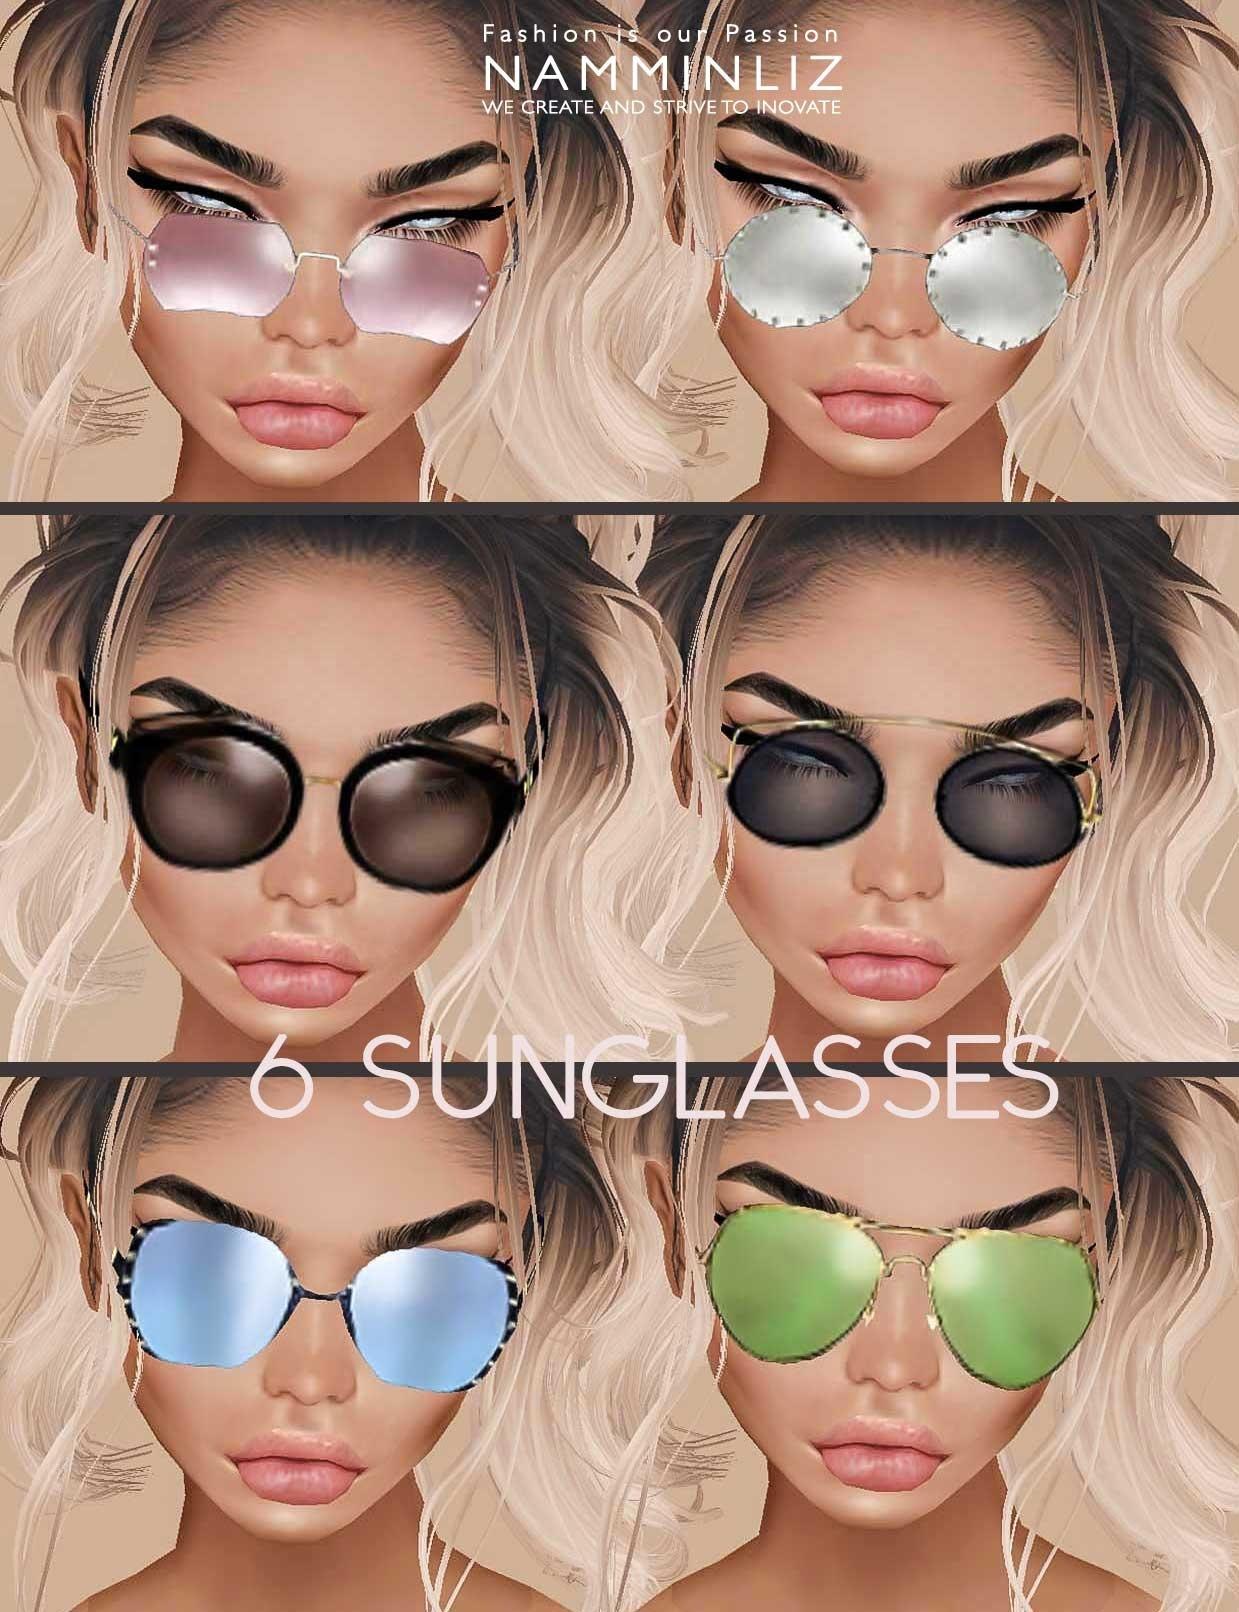 Sunglasses Accessories Full ( 1,2,3 ) 6 Textures JPG IMVU